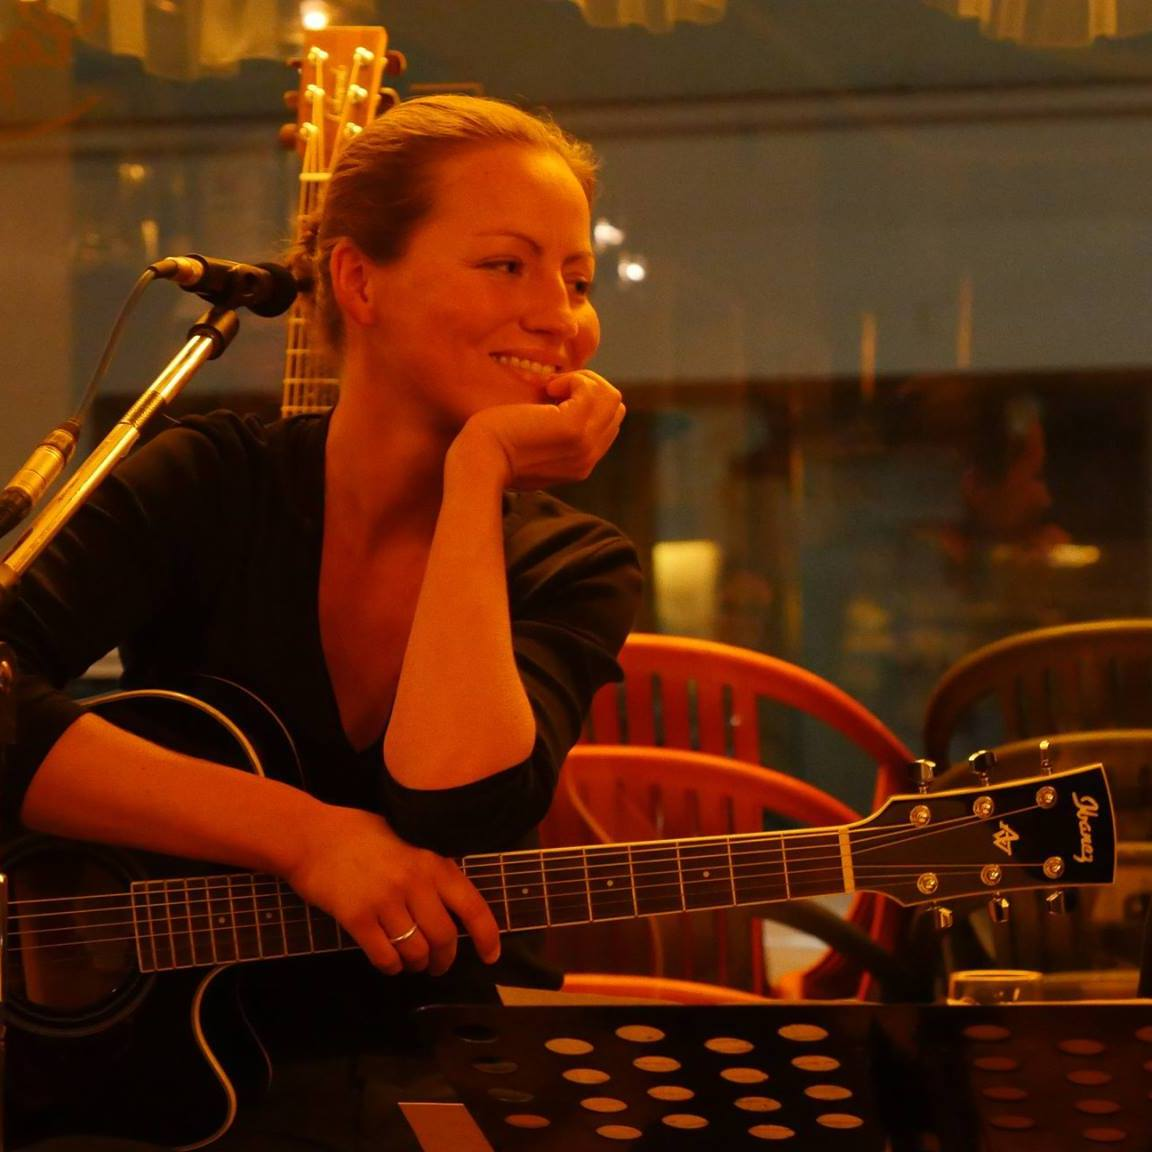 Miram Brenner Gesang, Gitarre